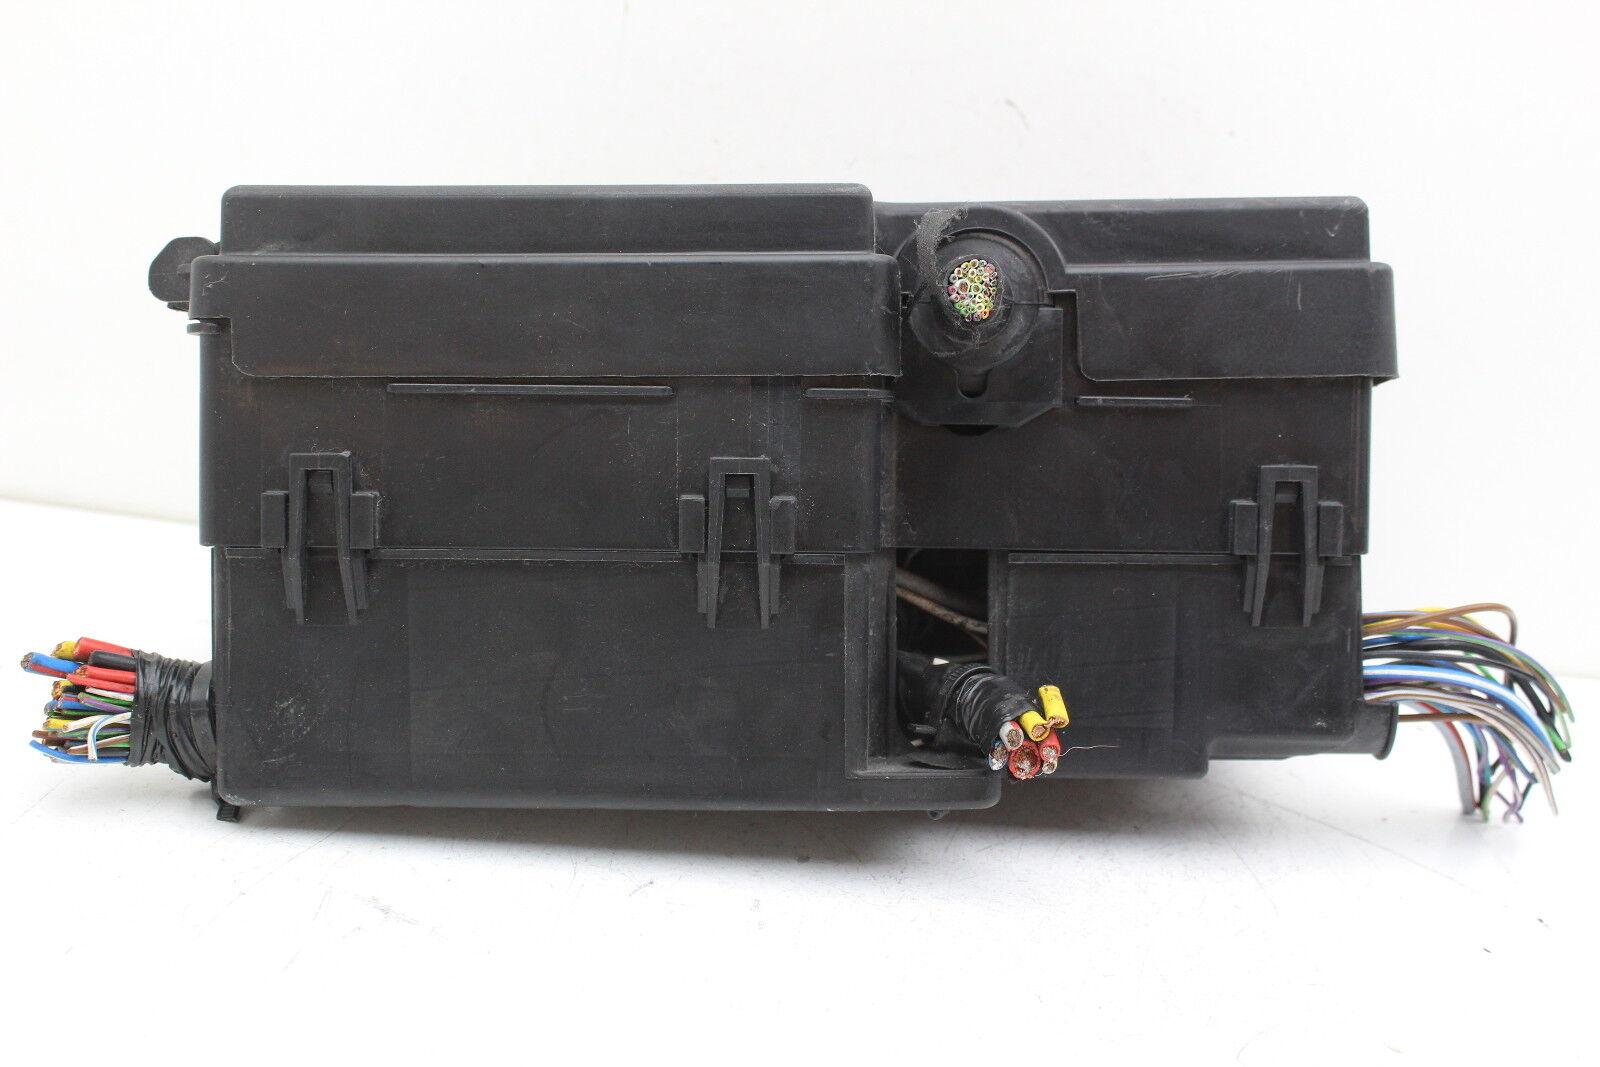 12 14 Ford Focus Av6t 14a142 Ab Fusebox Fuse Box Relay Unit Module 57 For Sale